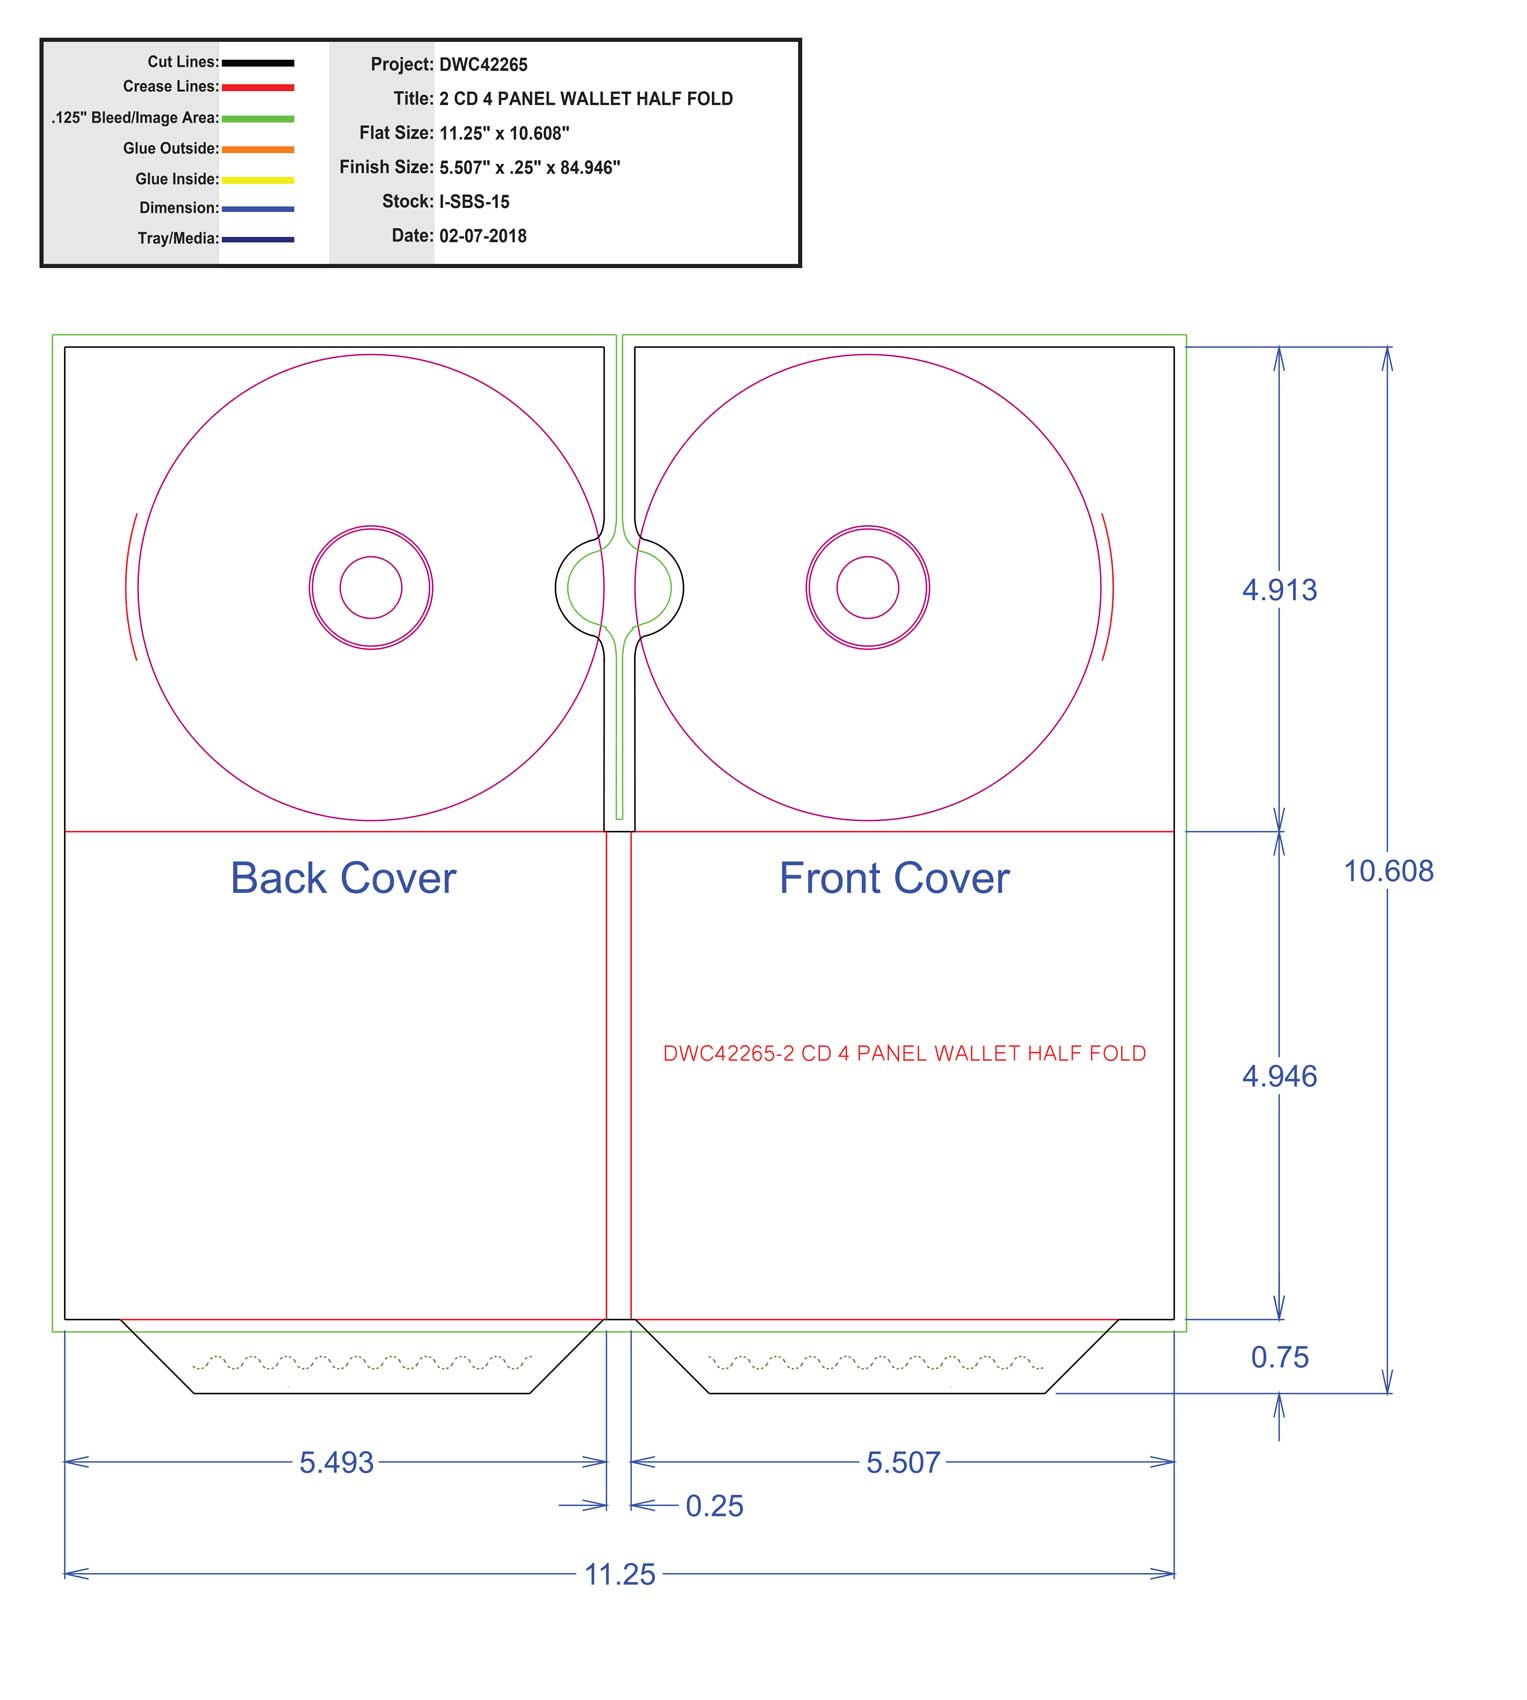 DWC42265-2 CD 4 PANEL WALLET HALF FOLD